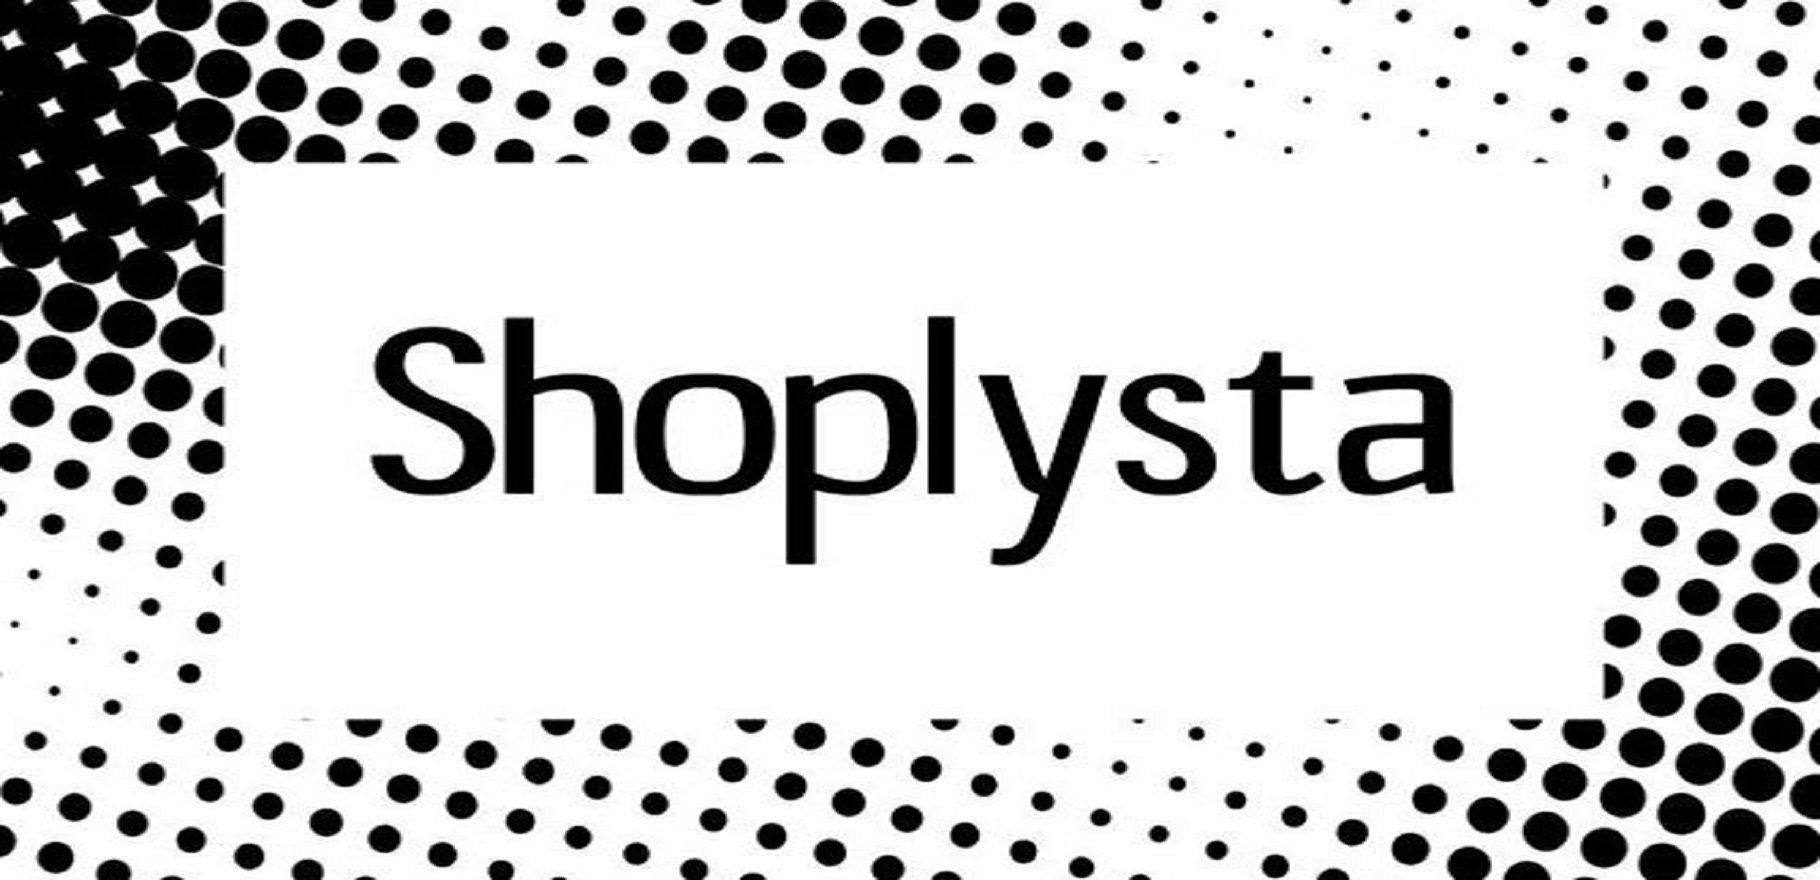 Shoplysta Postcard Front